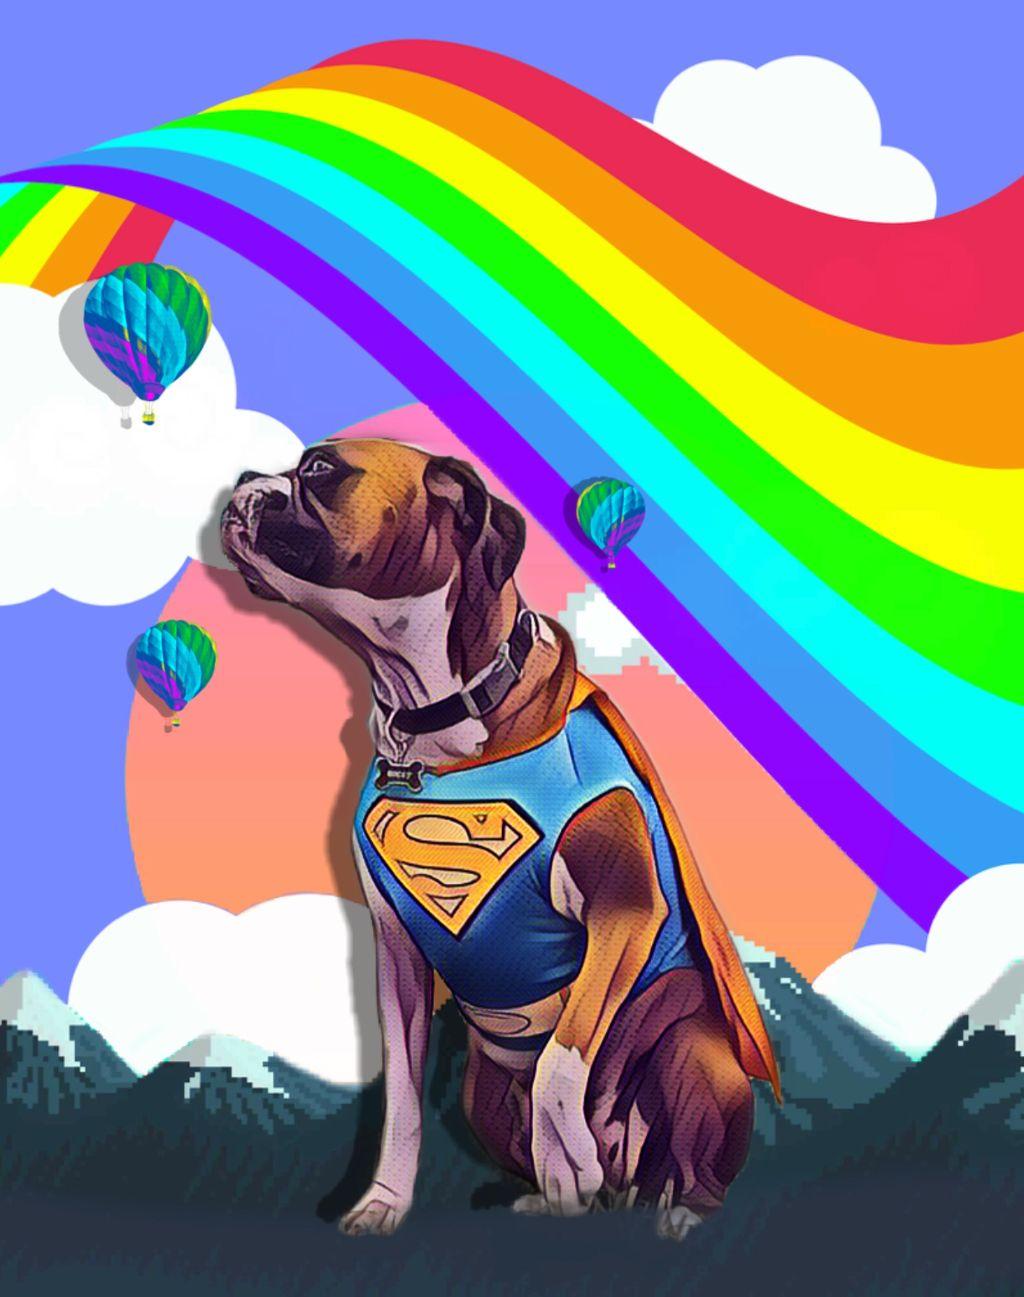 #freetoedit #dog #background #cuterainbow #vaporwave #popart #stickers #magiceffects #picsarteffects #picsart #remixed #remixme #remixit